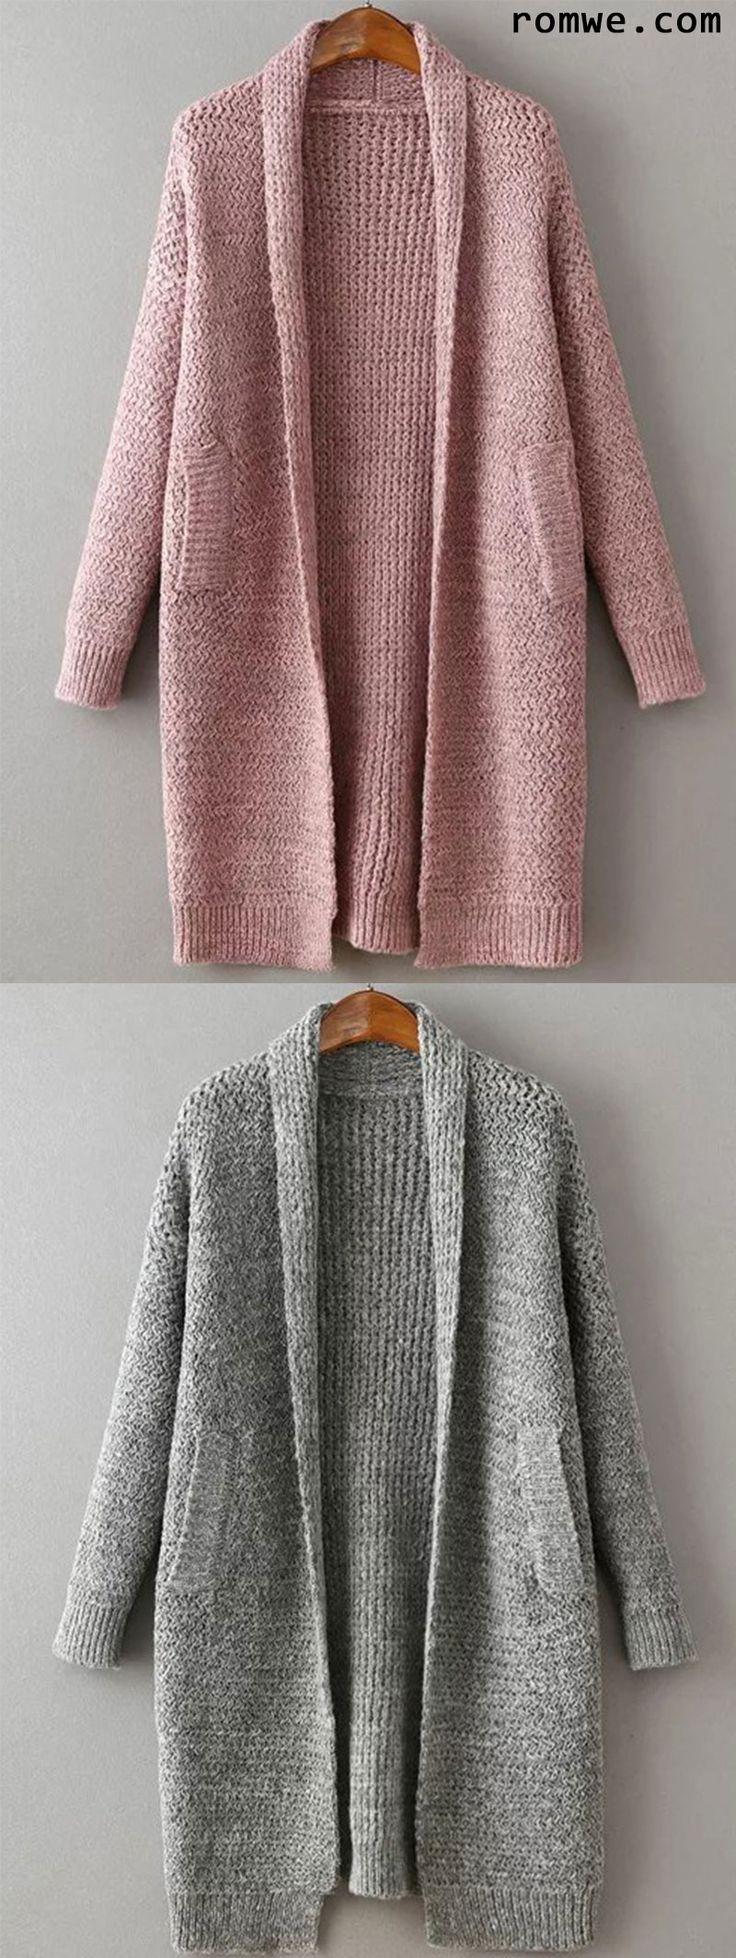 Shawl Collar Drop Shoulder Long Sweater Coat